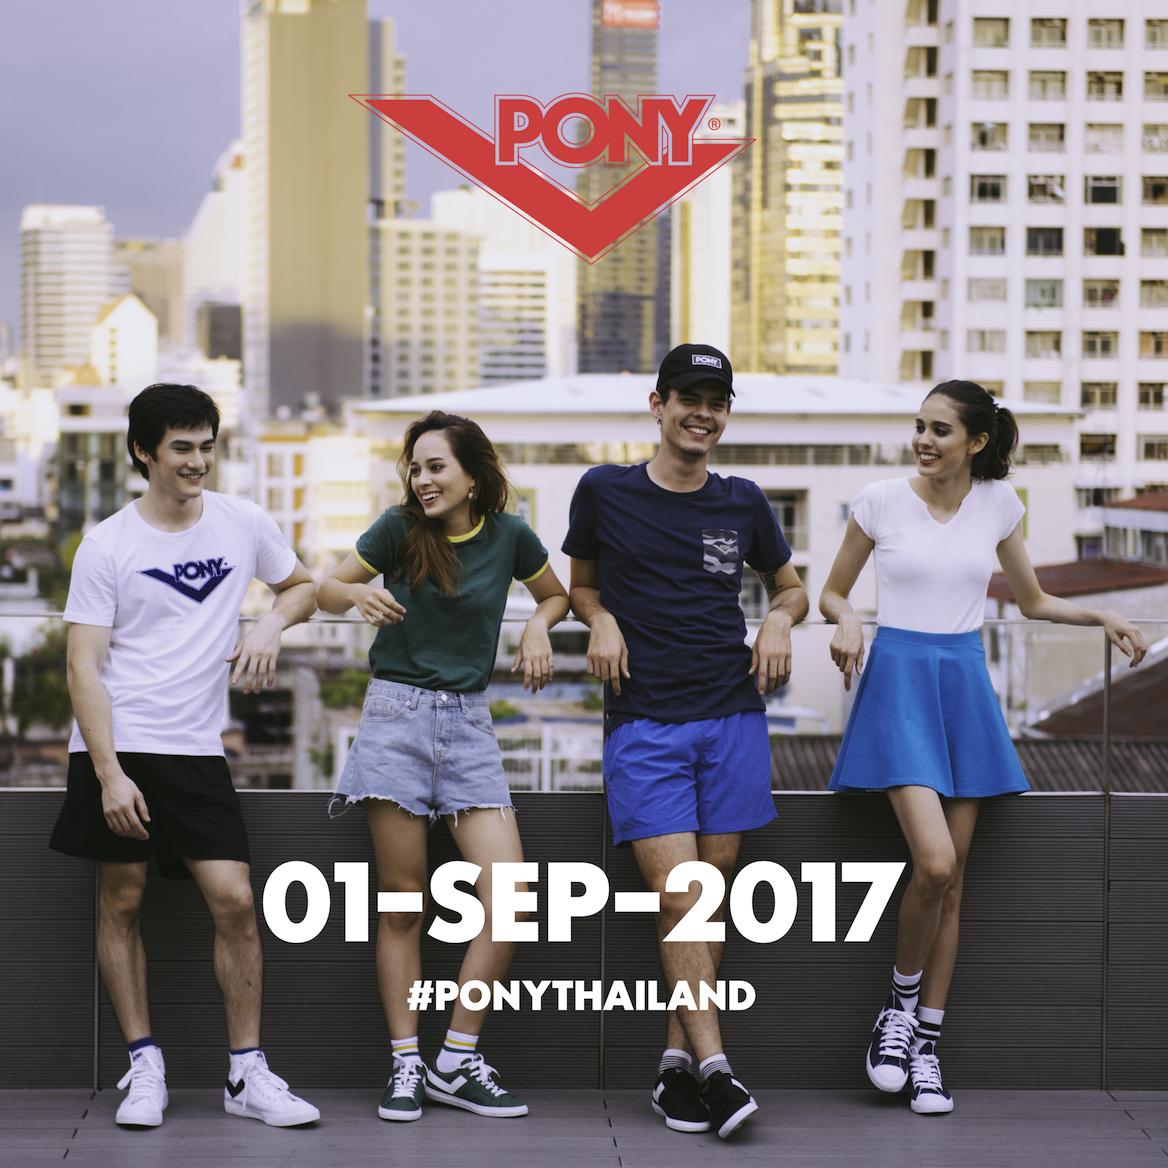 ponyFB